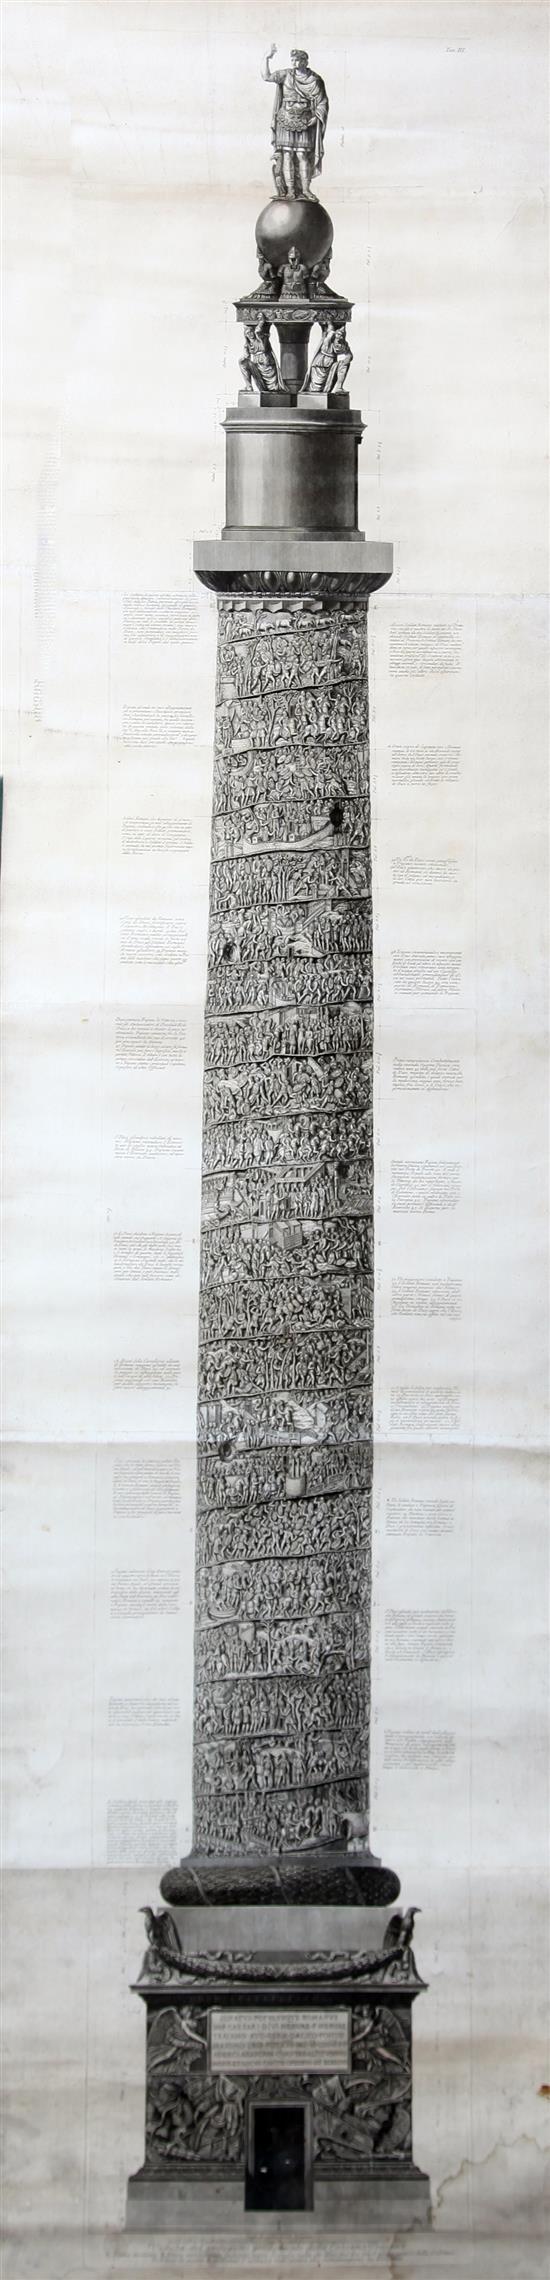 Giovanni Battista Piranesi - Engravings on joined paper